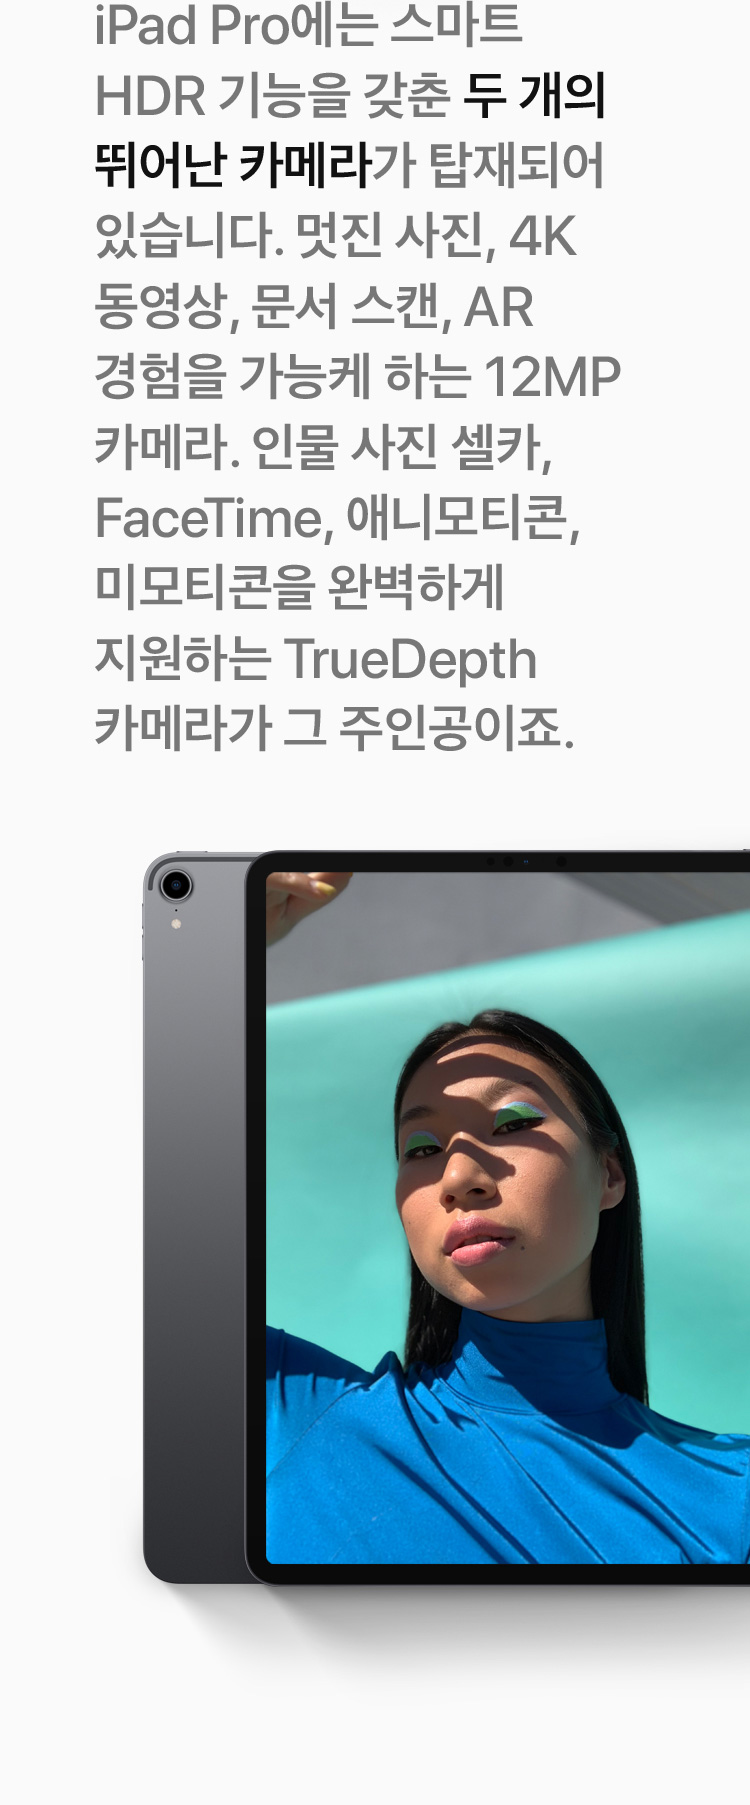 iPad Pro에는 스마트 HDR 기능을 갖춘 두 개의 뛰어난 카메라가 탑재되어 있습니다. 멋진 사진, 4K 동영상, 문서 스캔, AR 경험을 가능케 하는 12MP 카메라. 인물 사진 셀카, FaceTime, 애니모티콘, 미모티콘을 완벽하게 지원하는 TrueDepth 카메라가 그 주인공이죠.